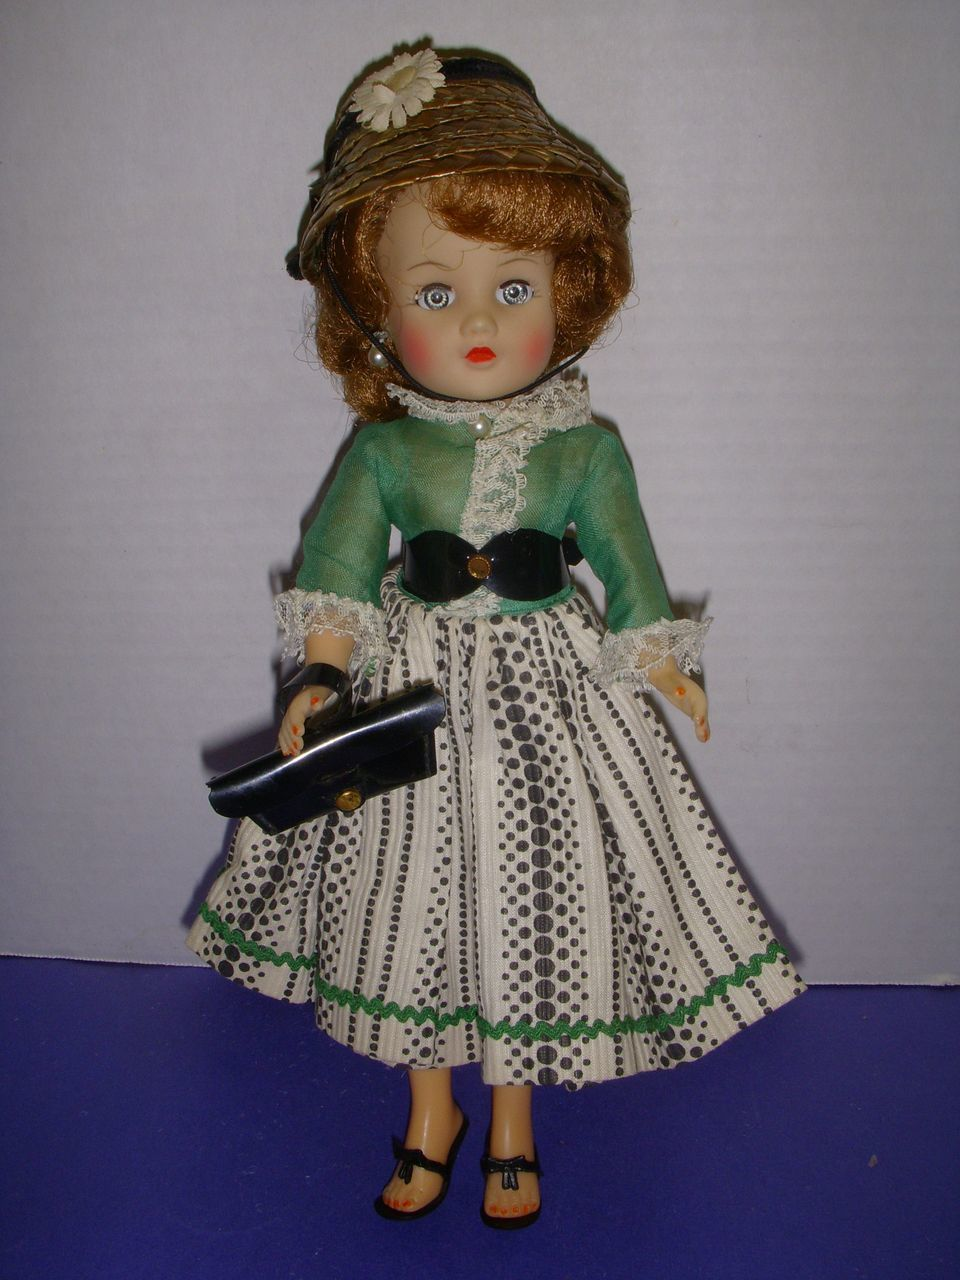 vintage 1950s miss nancy ann doll all original from kathysandterrysdolls on ruby lane. Black Bedroom Furniture Sets. Home Design Ideas